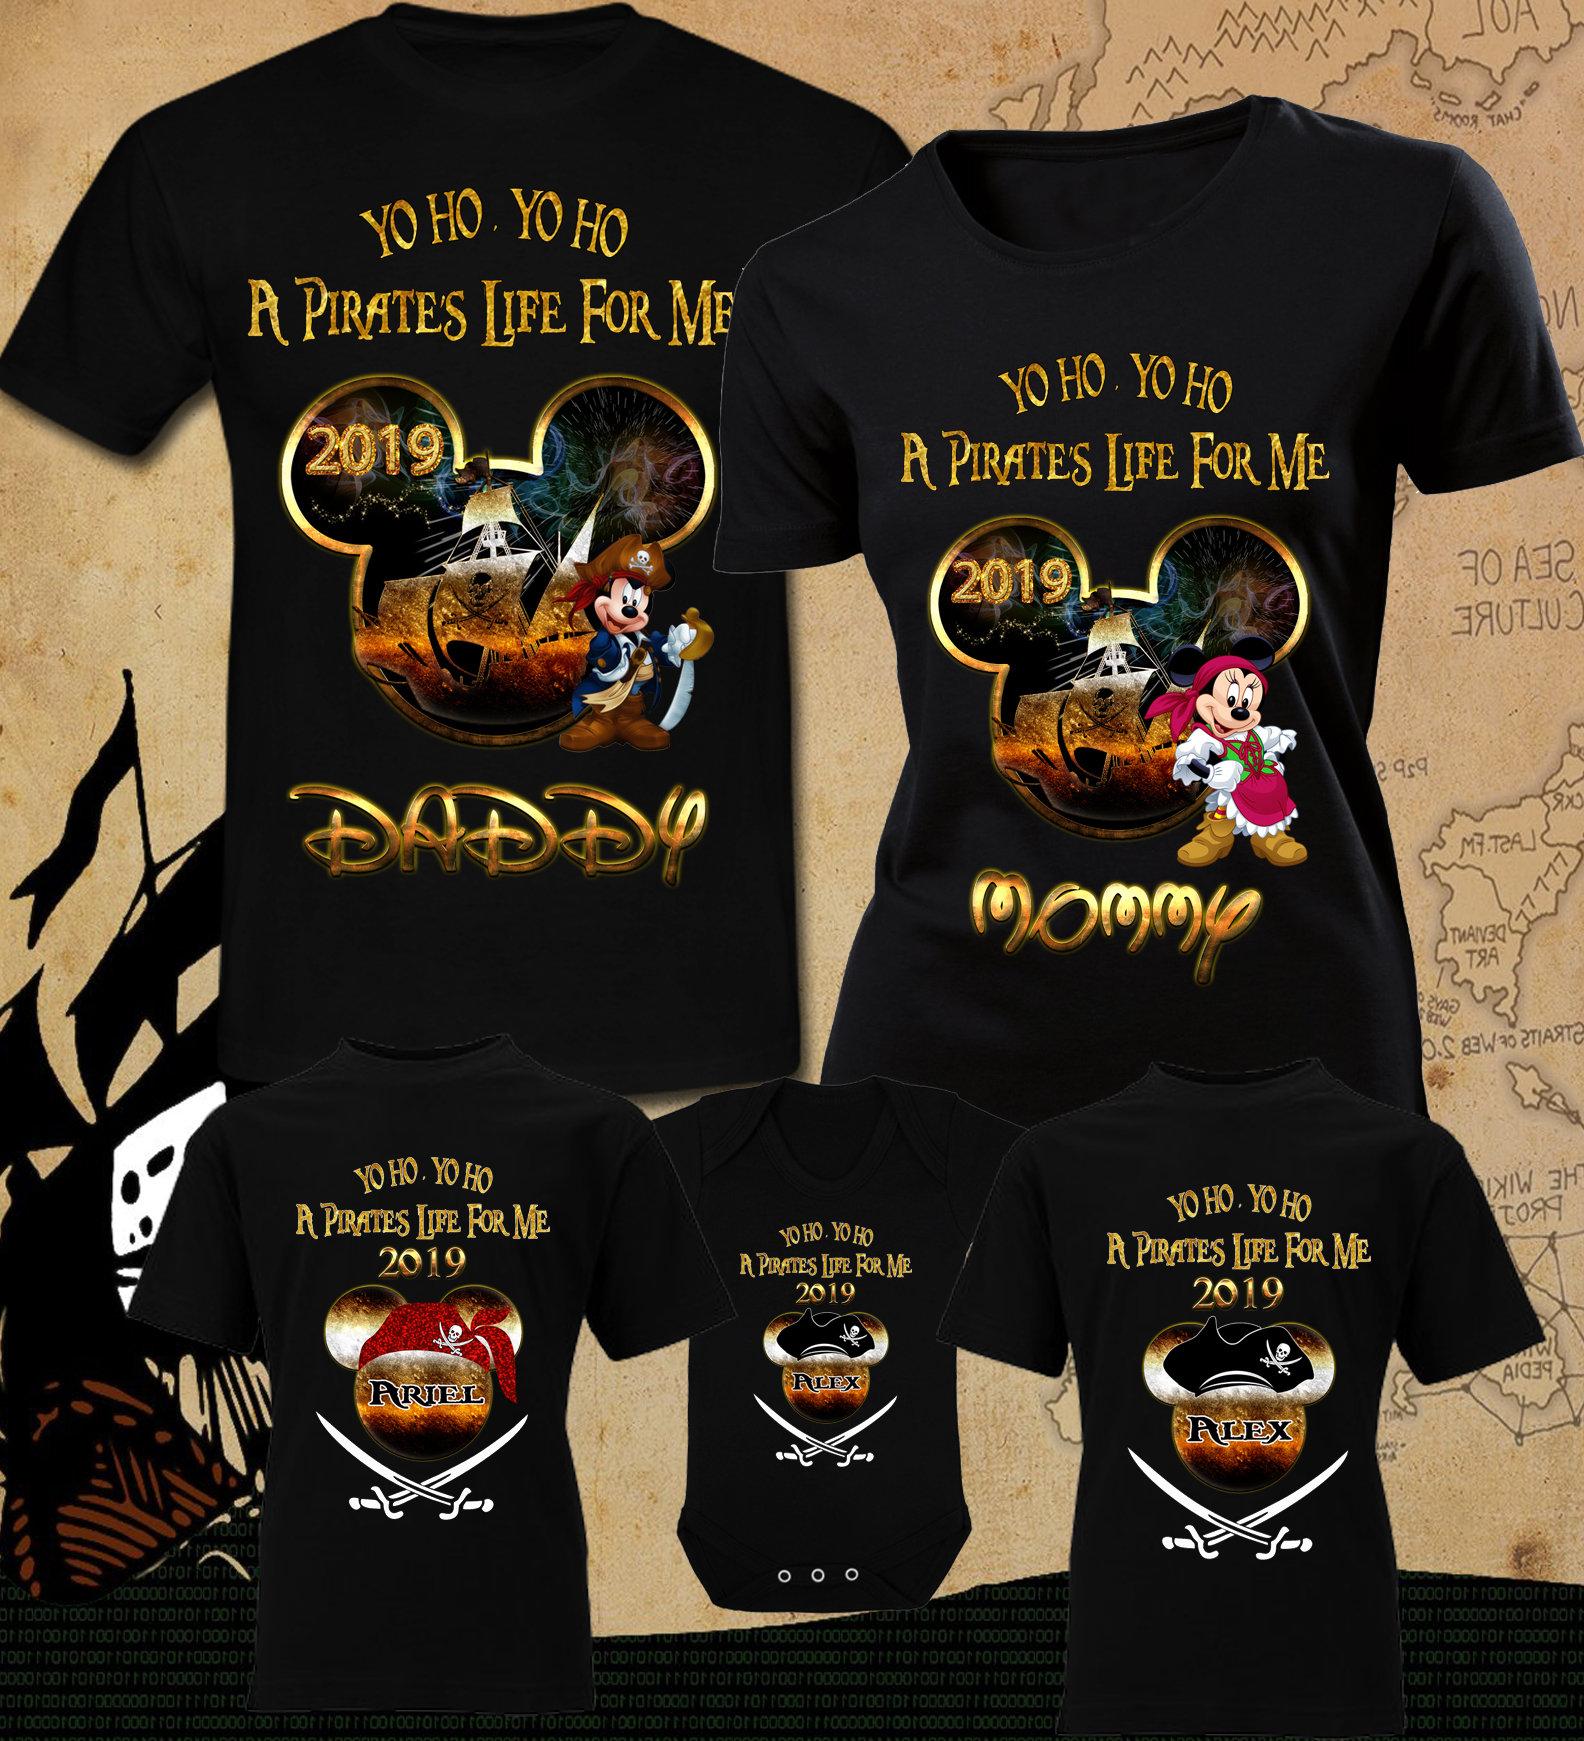 38bc4fc36 We Are Family Pirates T Shirt - Nils Stucki Kieferorthopäde